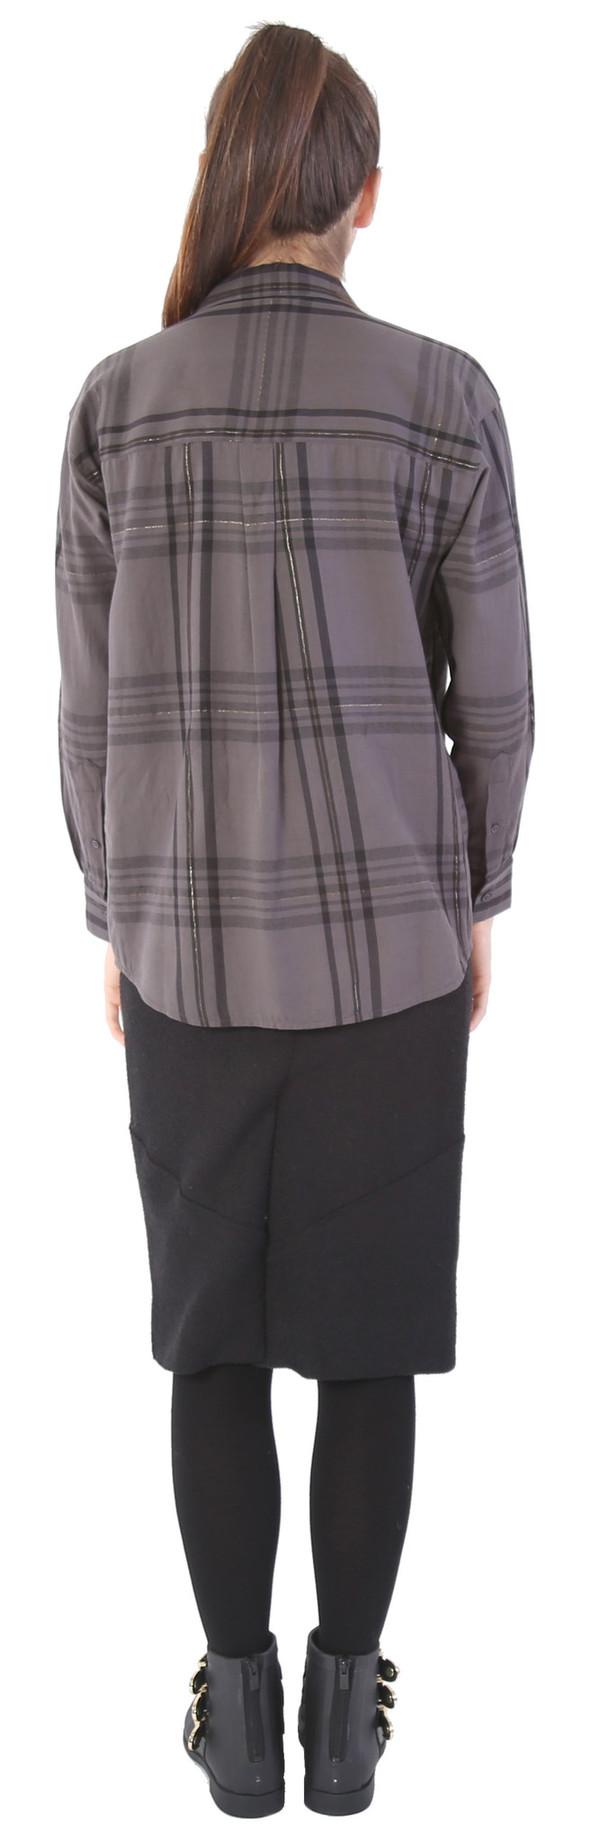 Swildens Prince Shirt